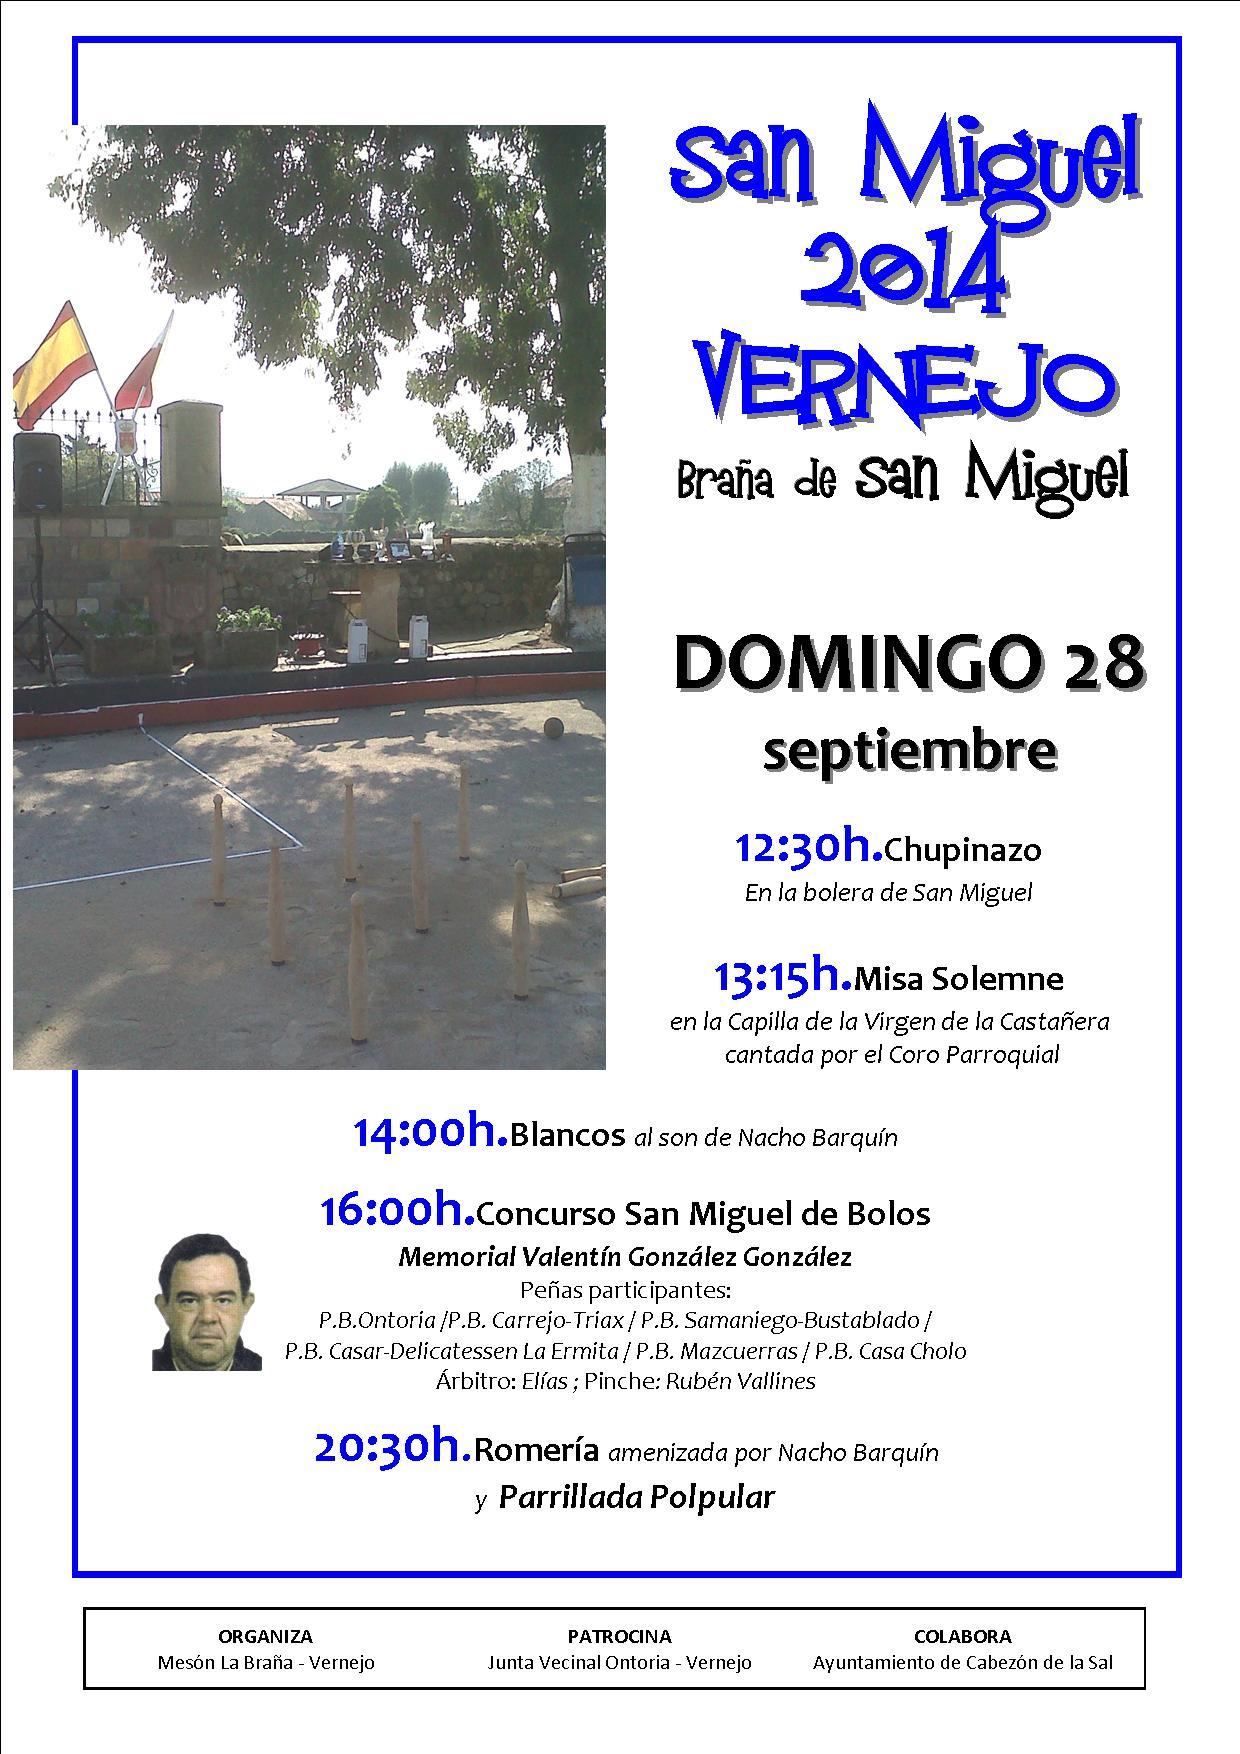 http://www.cabezondelasal.net/wp-content/uploads/2014/09/san-miguel-vernejo-20141.jpg